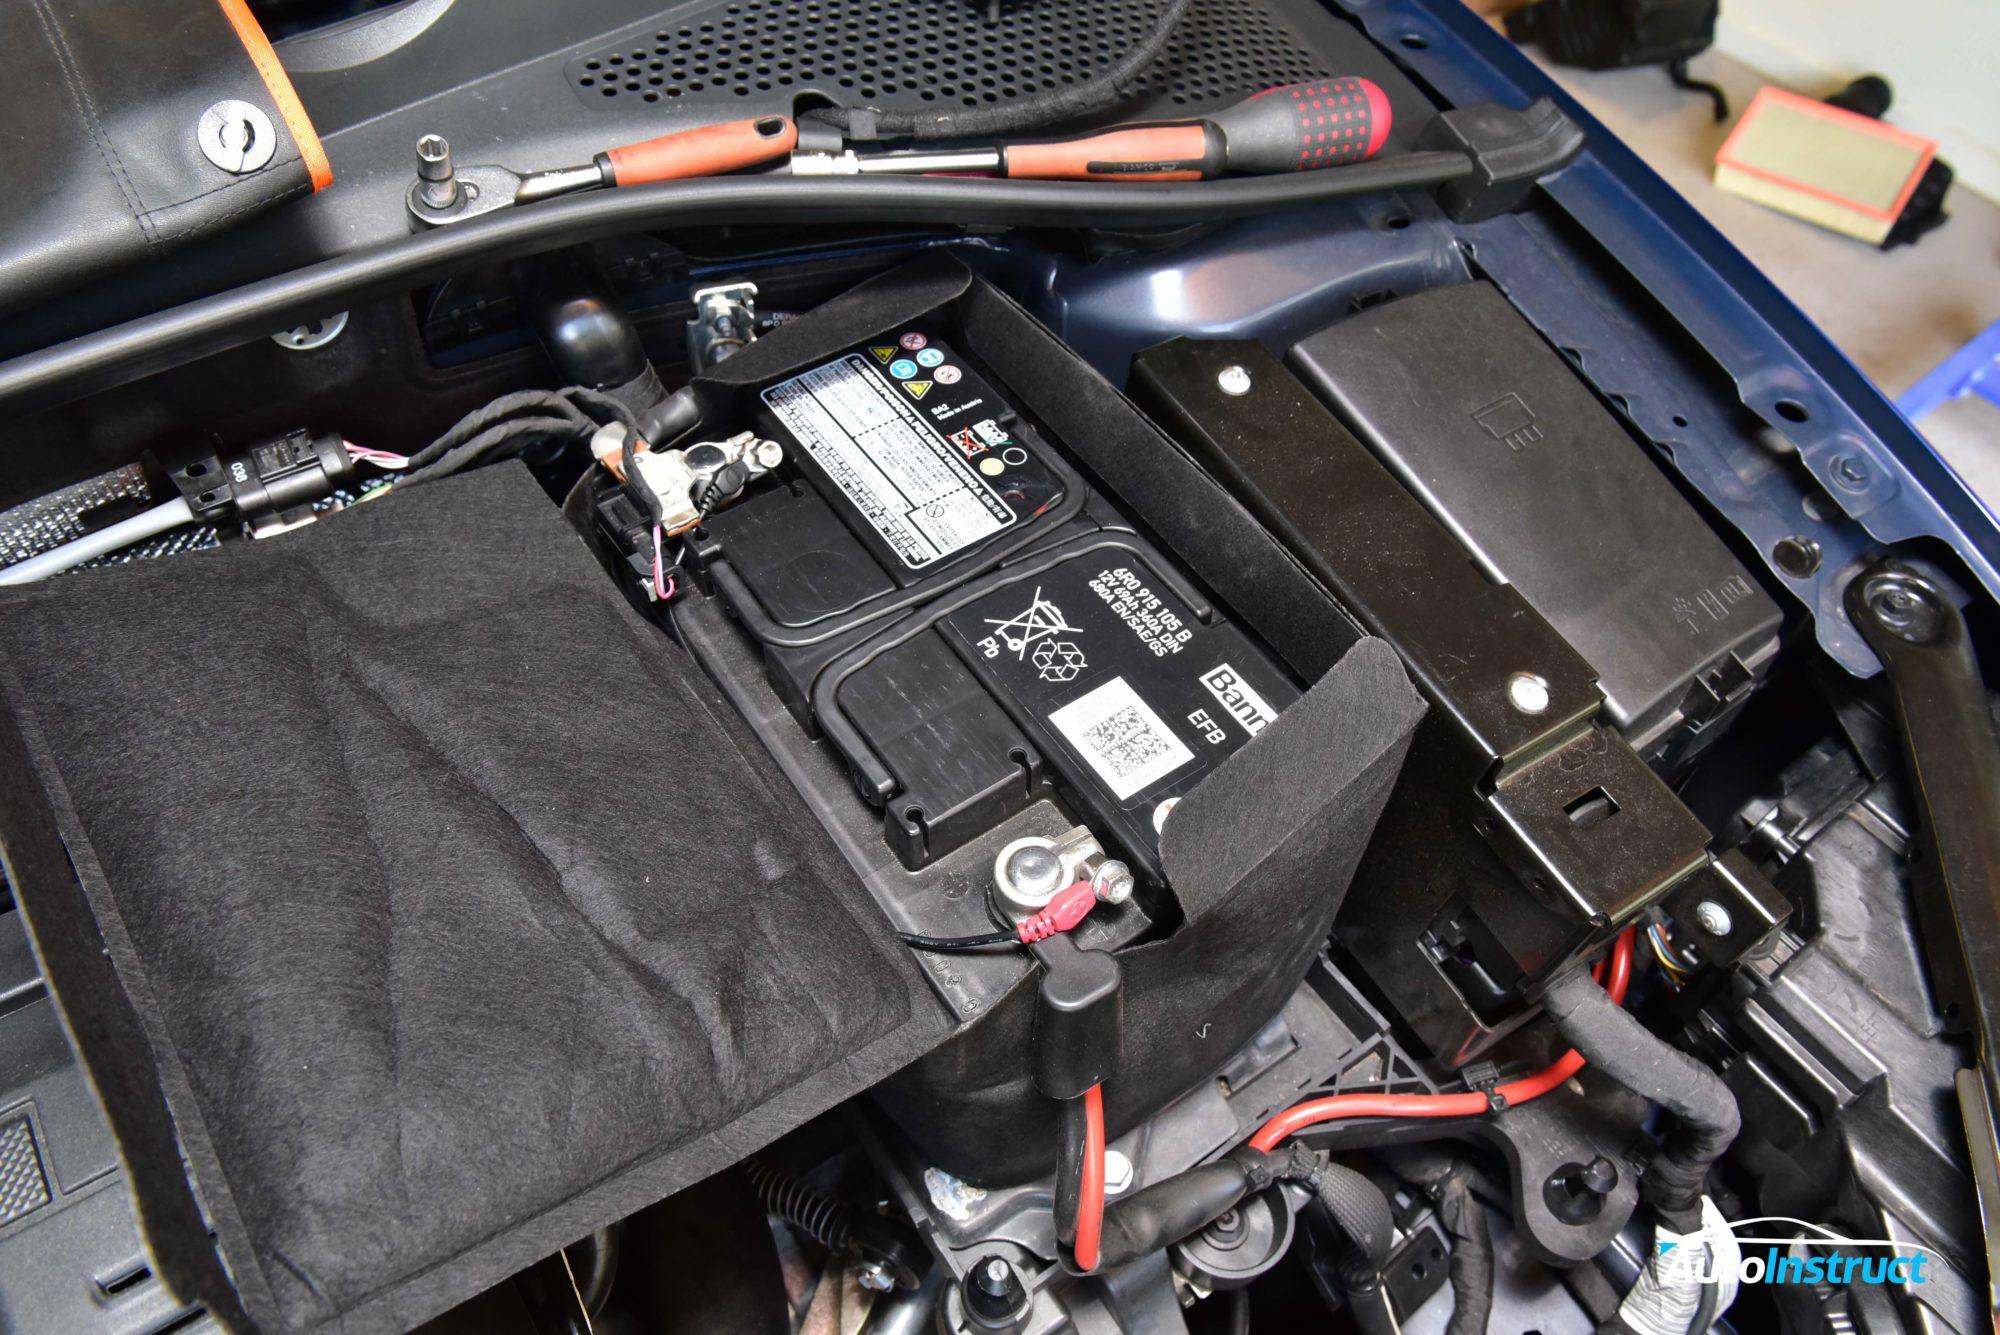 MK7 Golf Battery